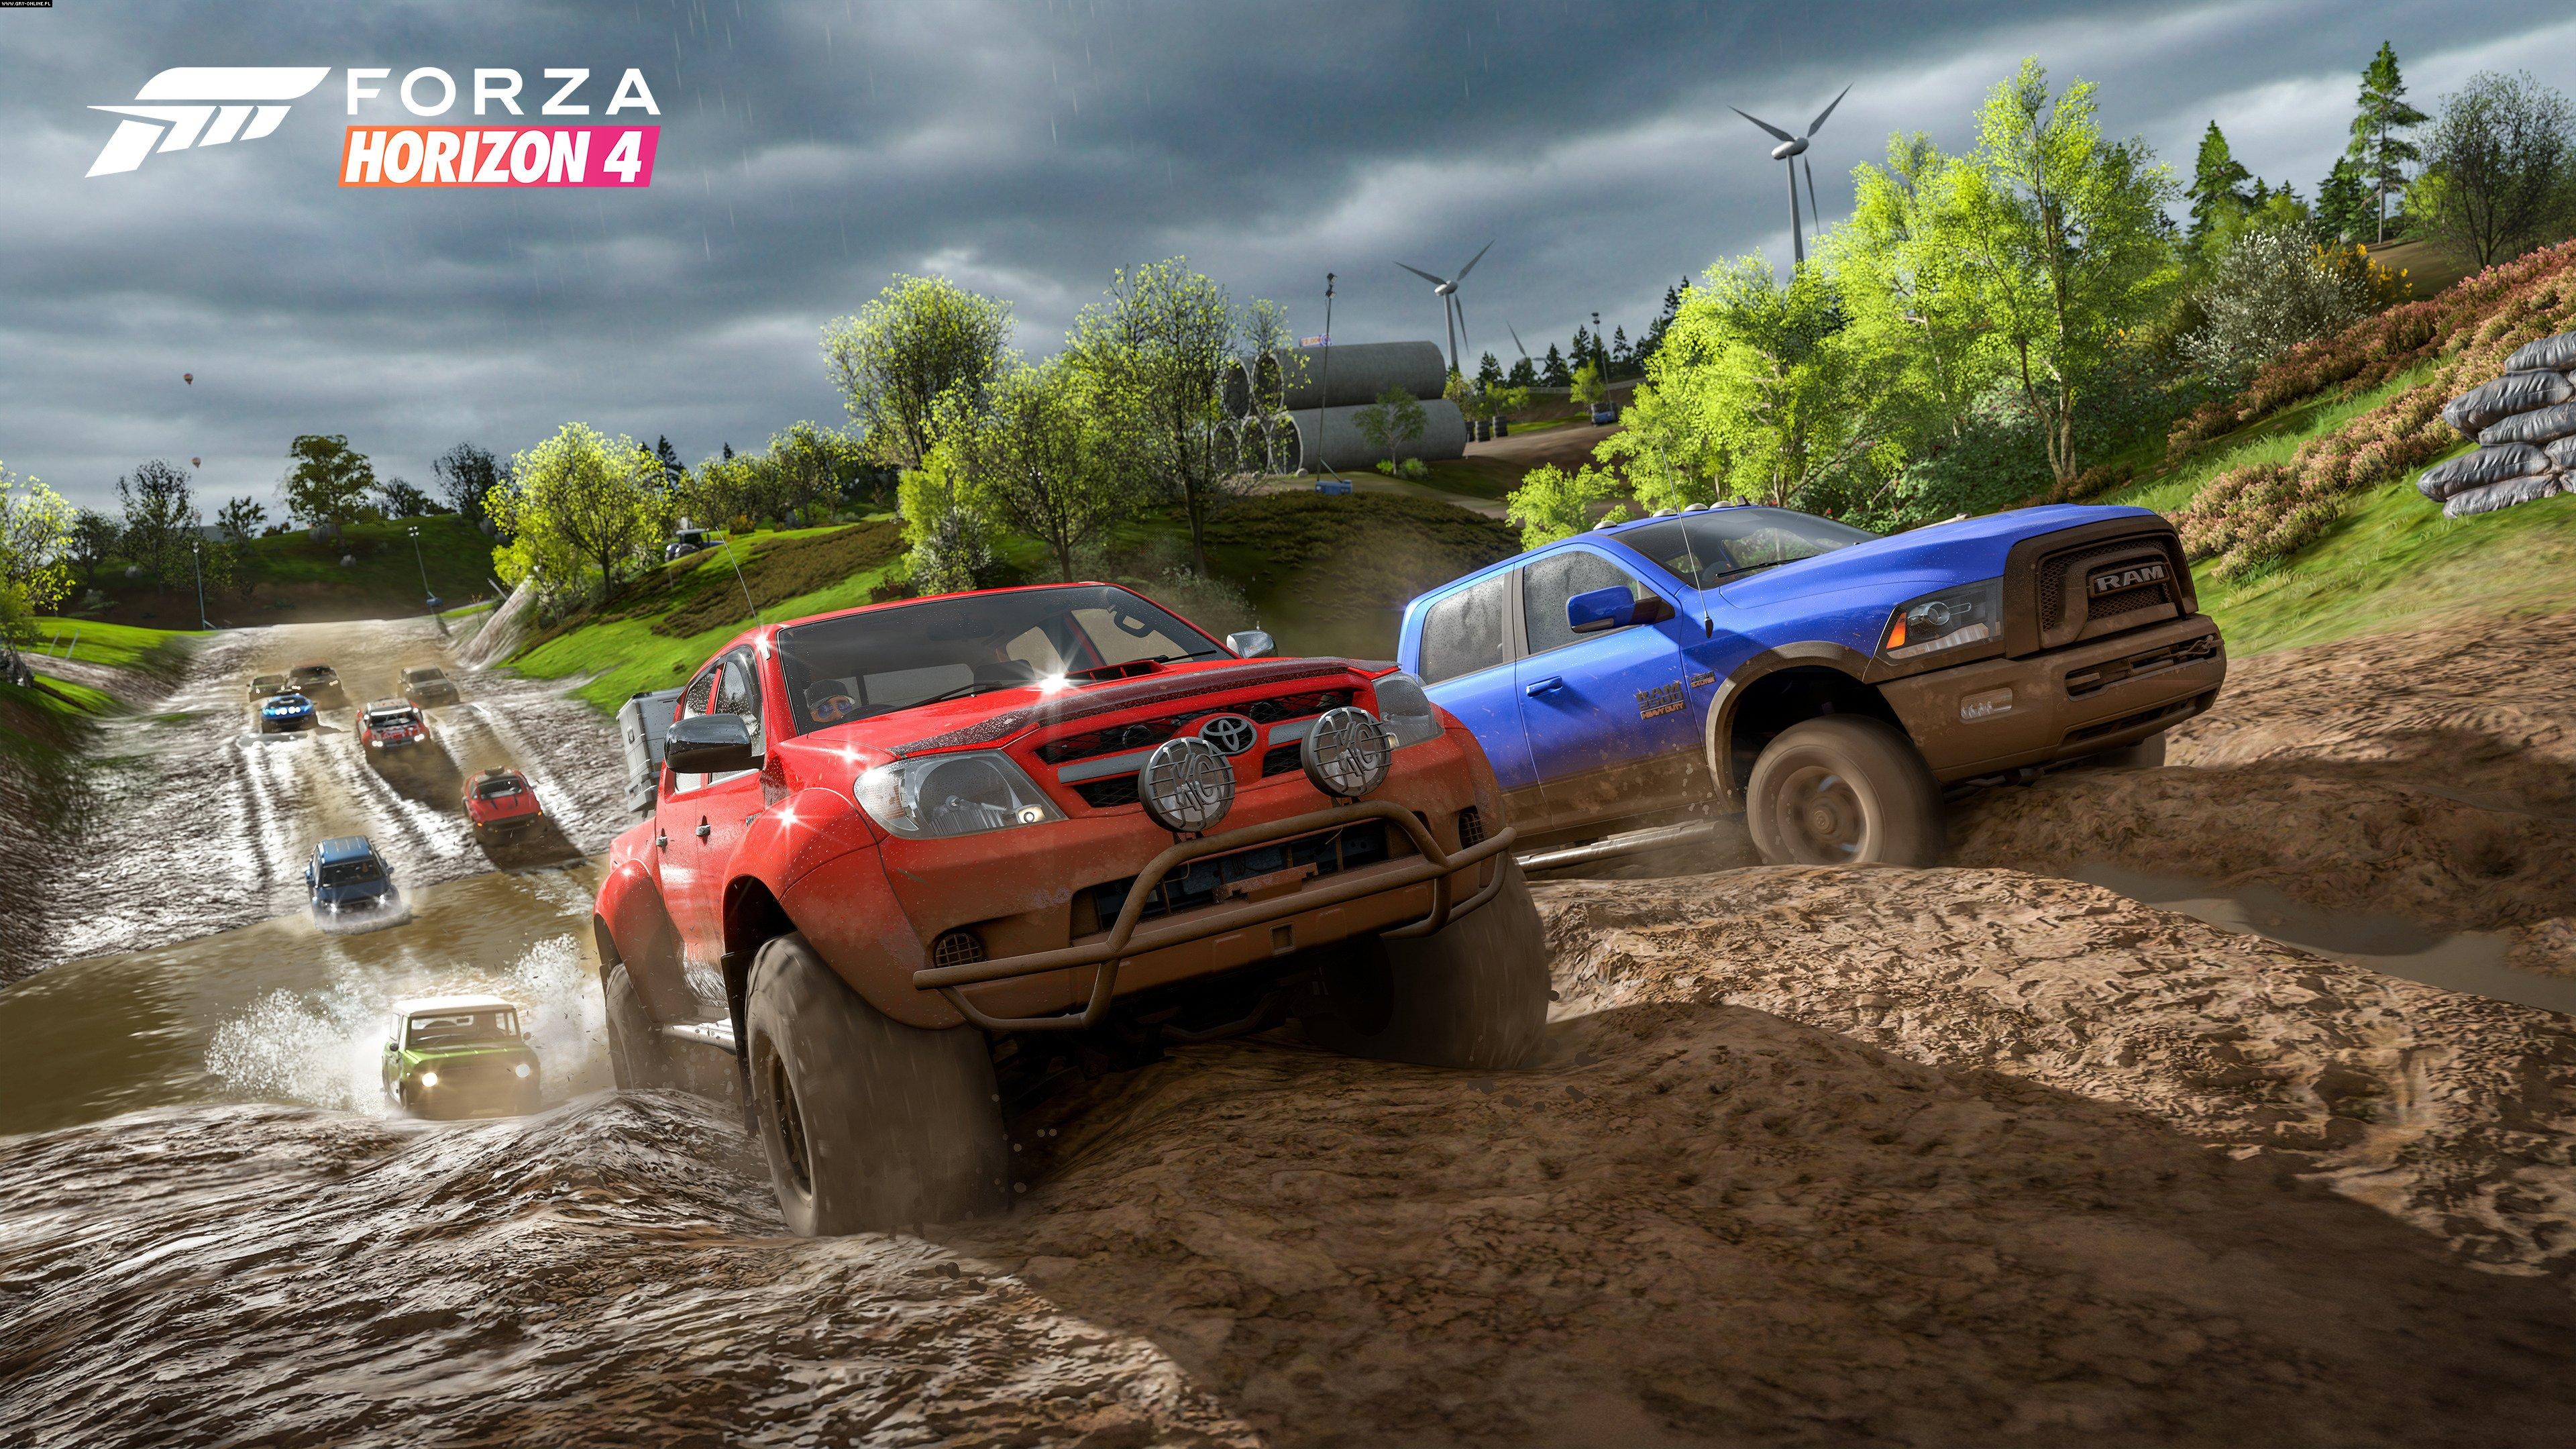 Forza Horizon 4 PC, XONE Games Image 14/14, Playground Games, Microsoft Studios